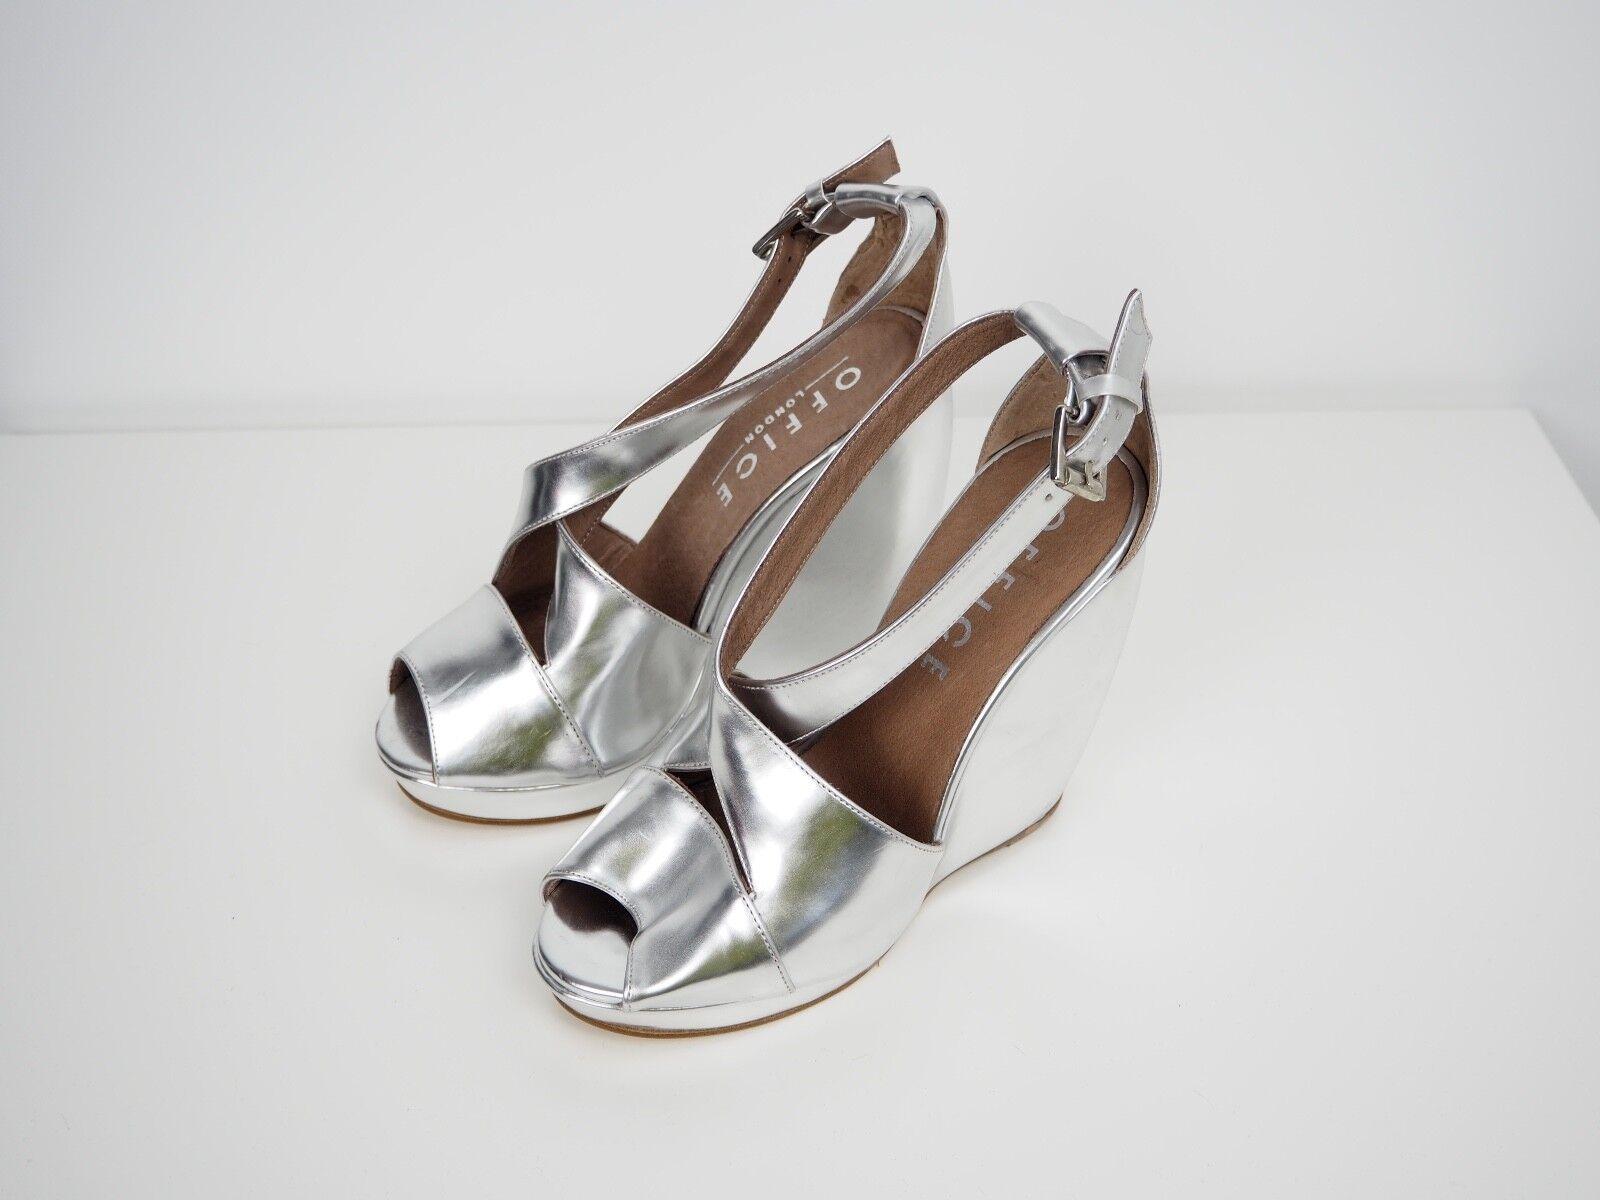 Office Silver Wedges Cross Damens Strap Buckle Heels Schuhes Damens Cross Retro 90's Wedding 1edc5f